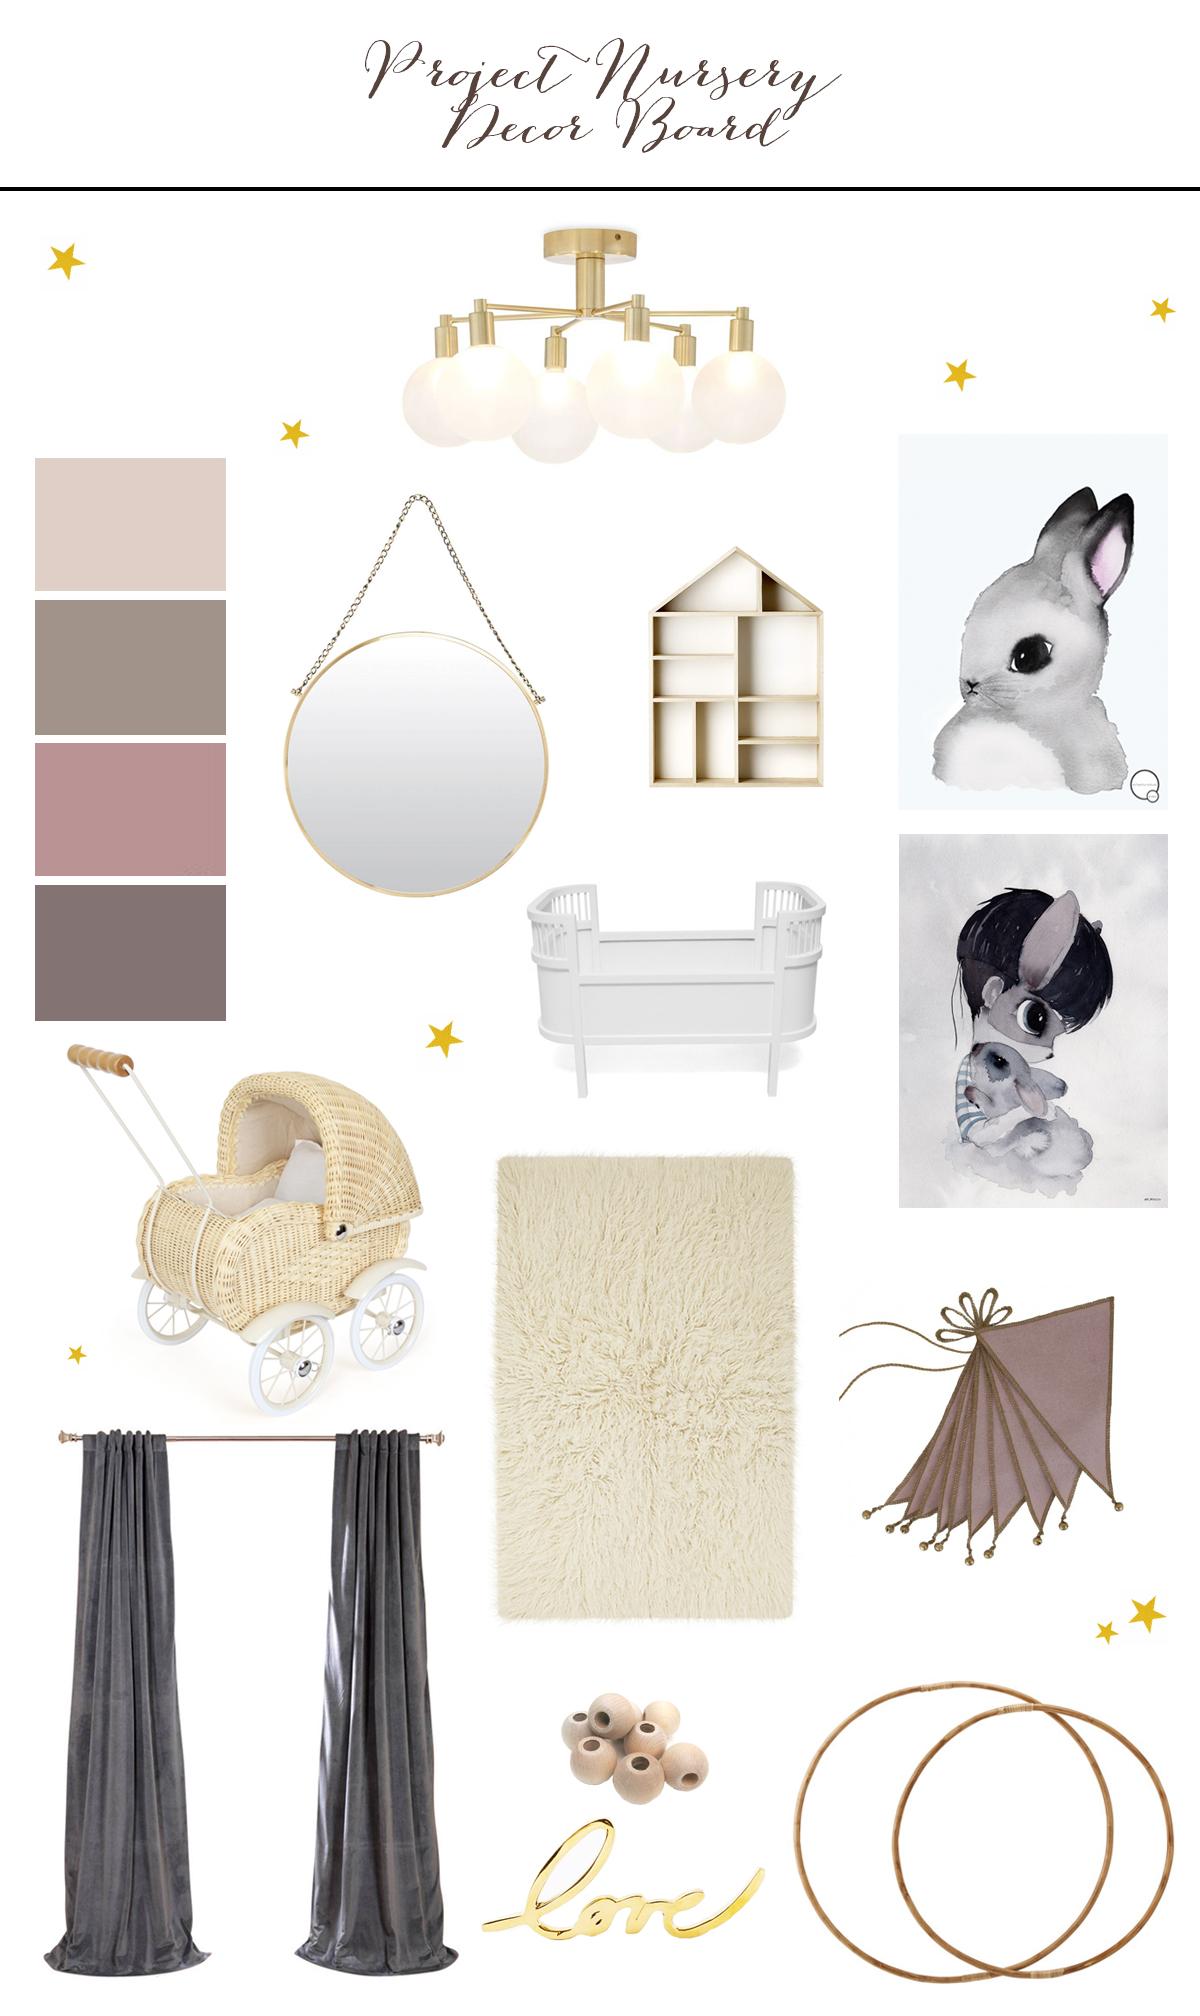 Preciously Me blog : Project Nursery - Decor Board